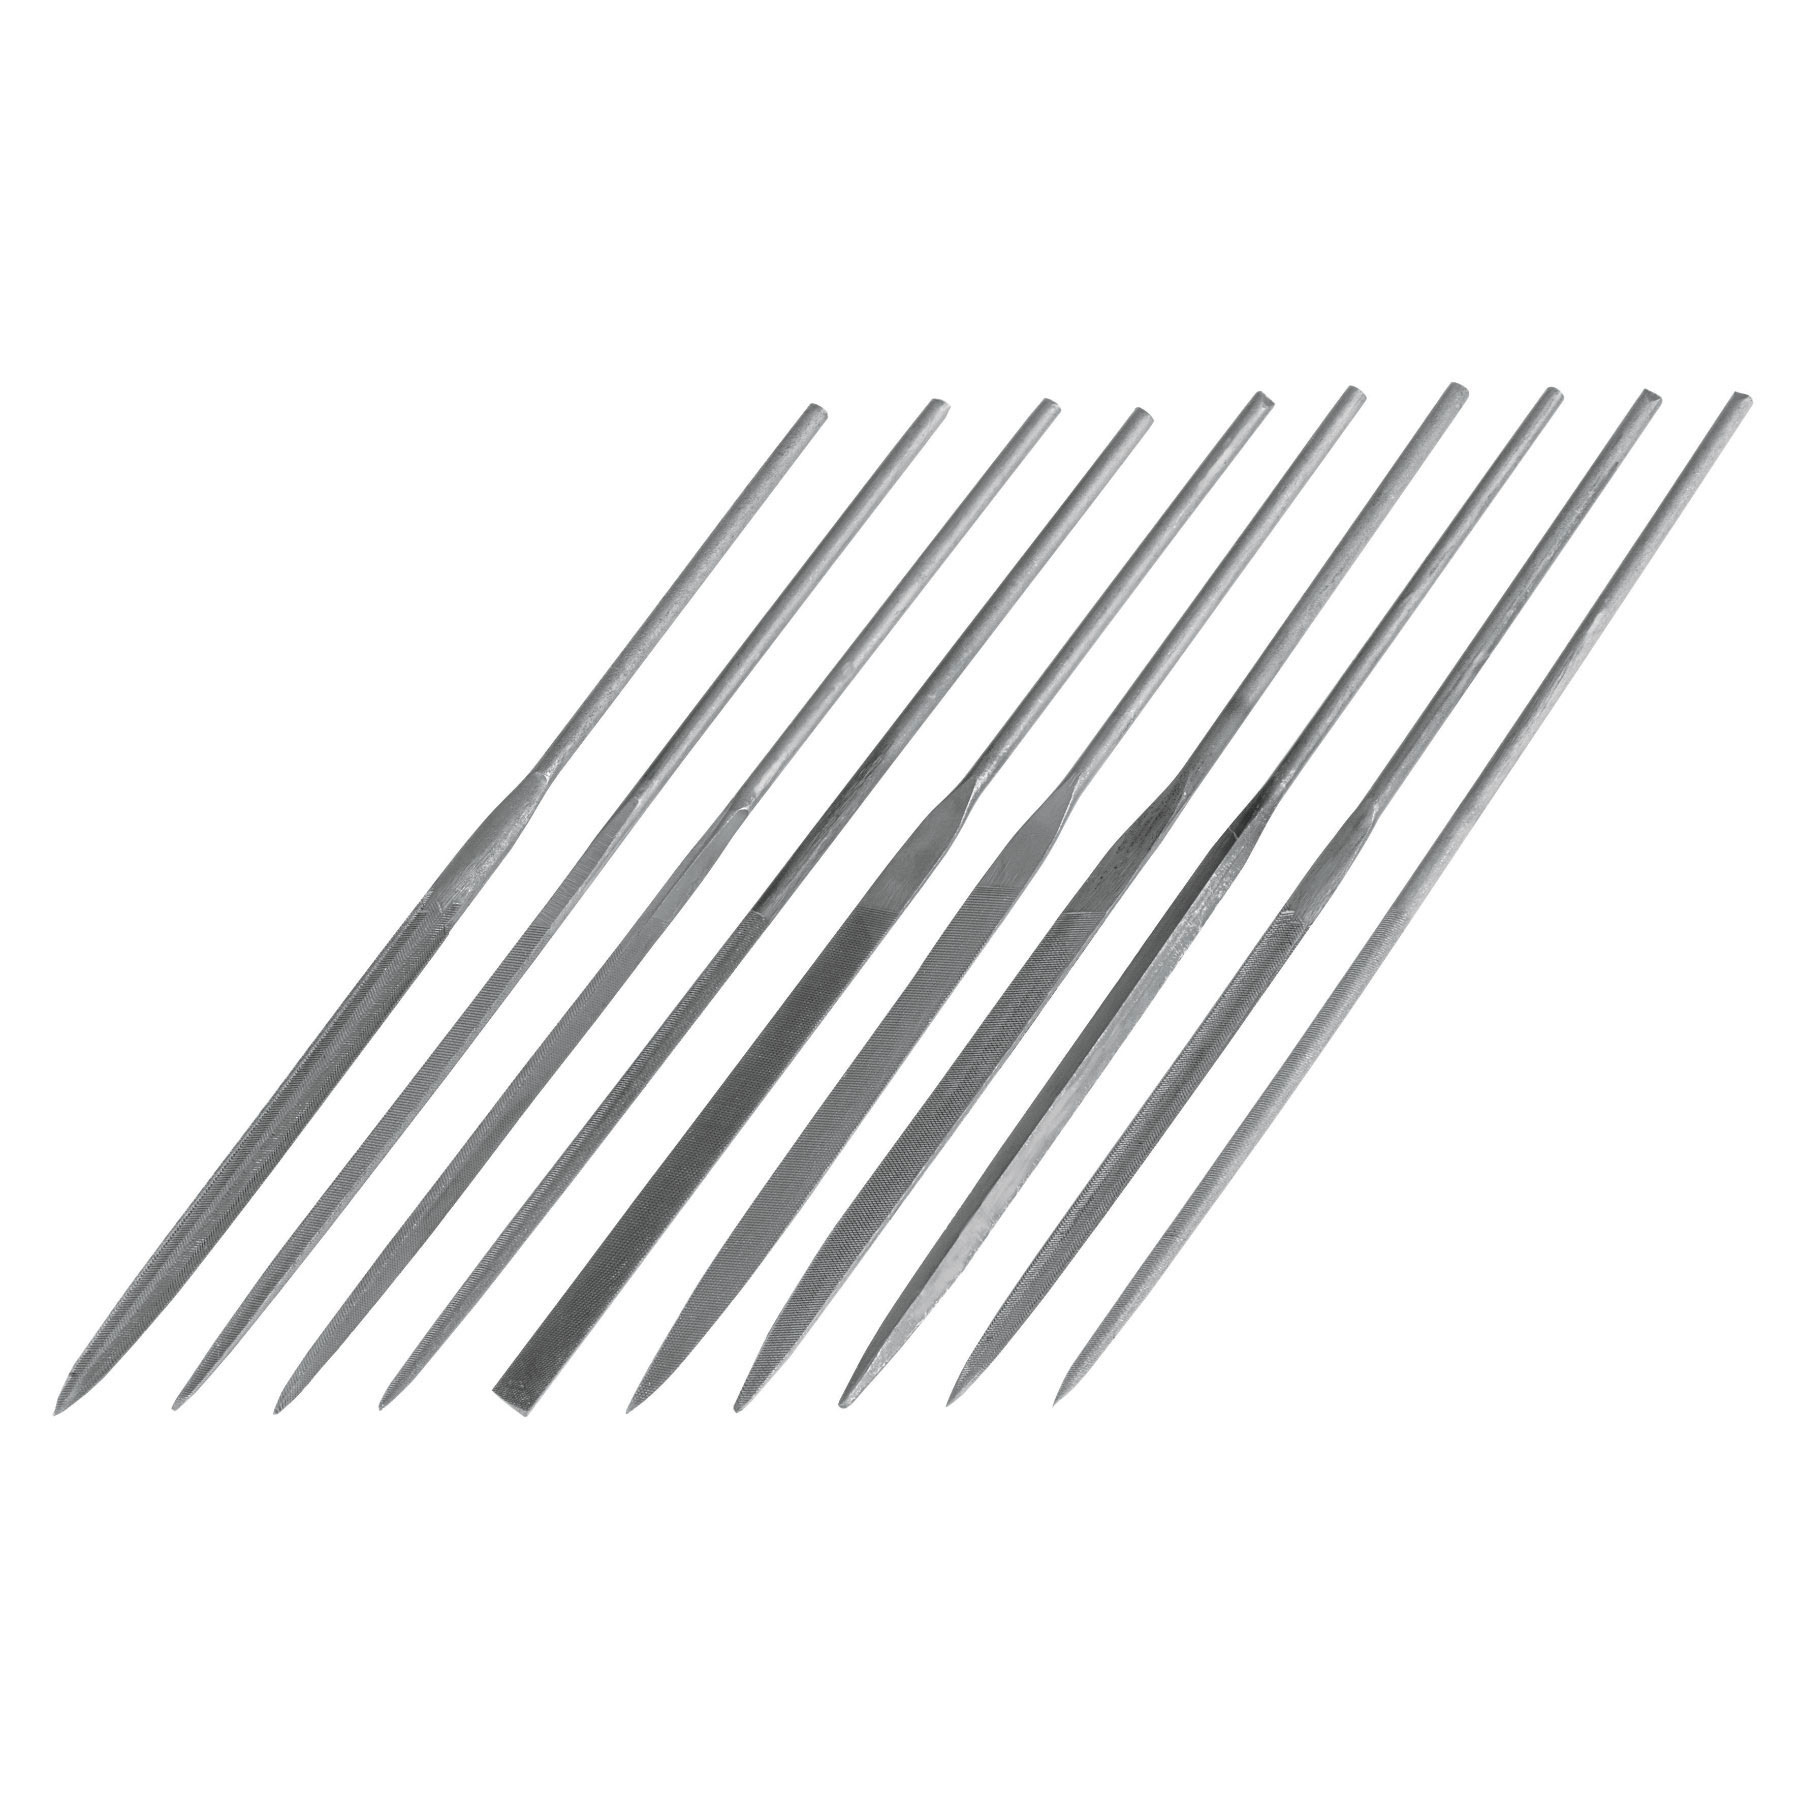 Truper - Limas para joyero, 10 piezas